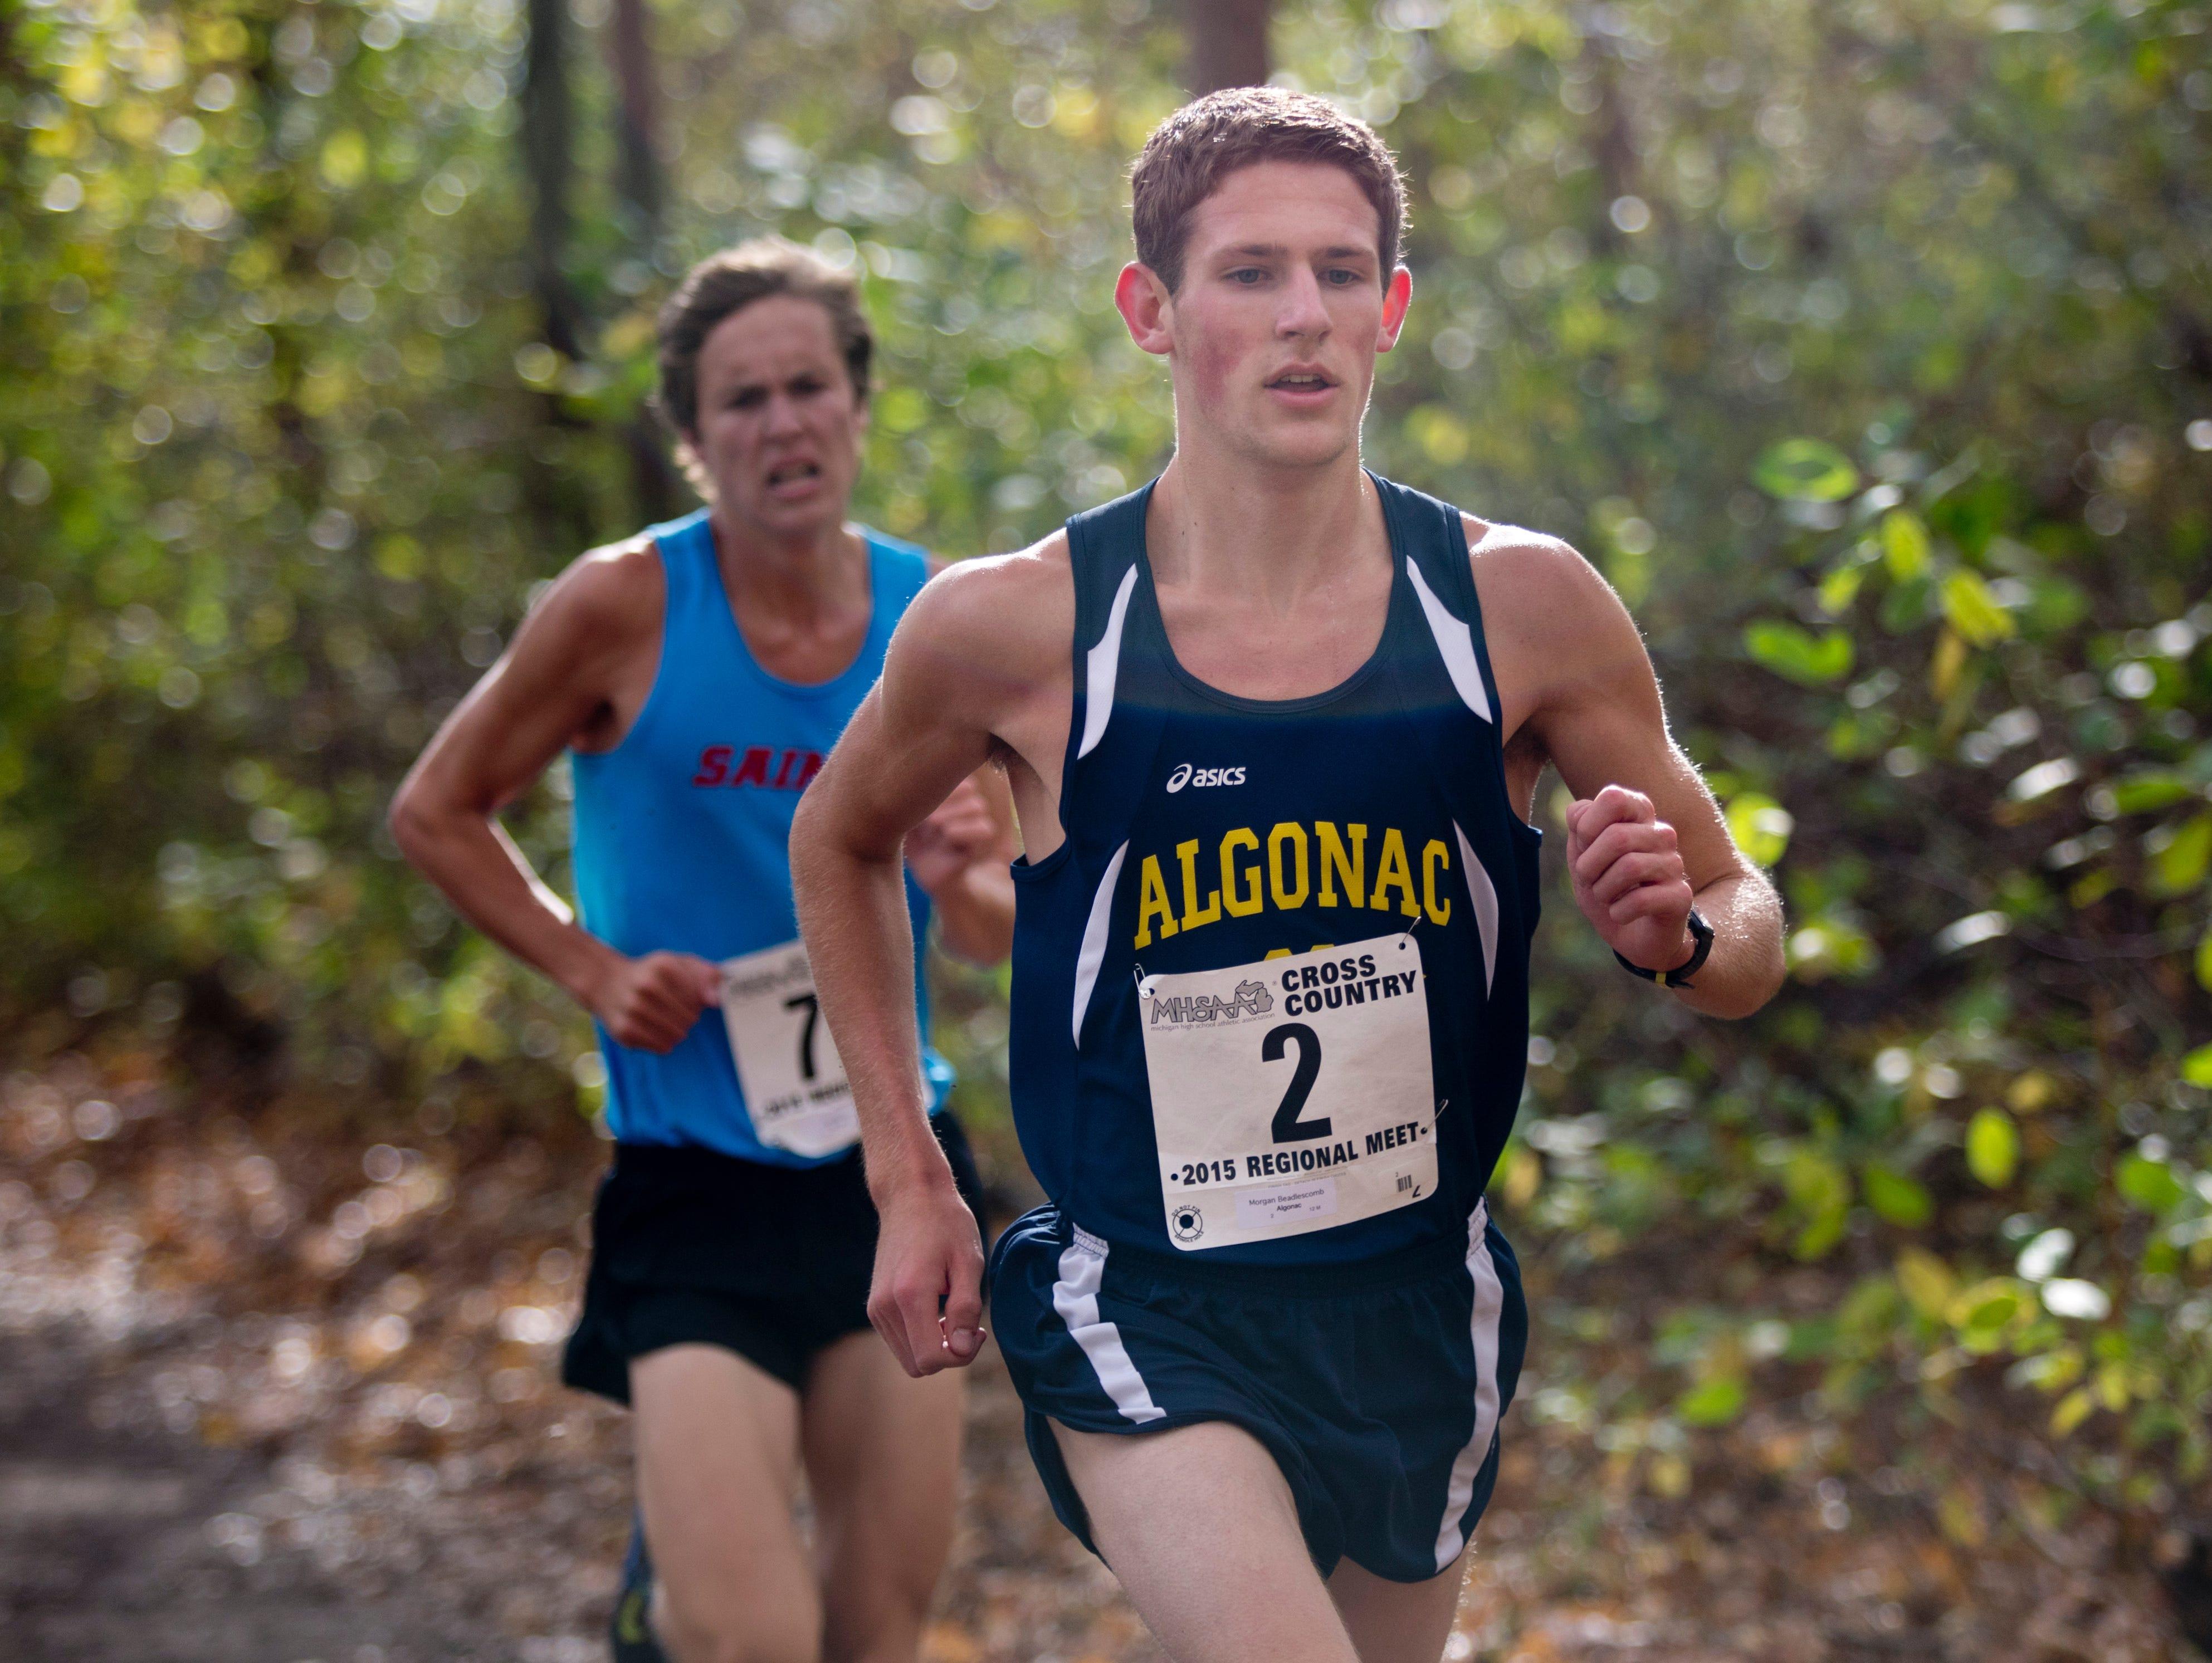 Alognac's Mogan Beadlescomb runs during a regional cross county meet Friday, October 30, 2015 at Algonac High School.